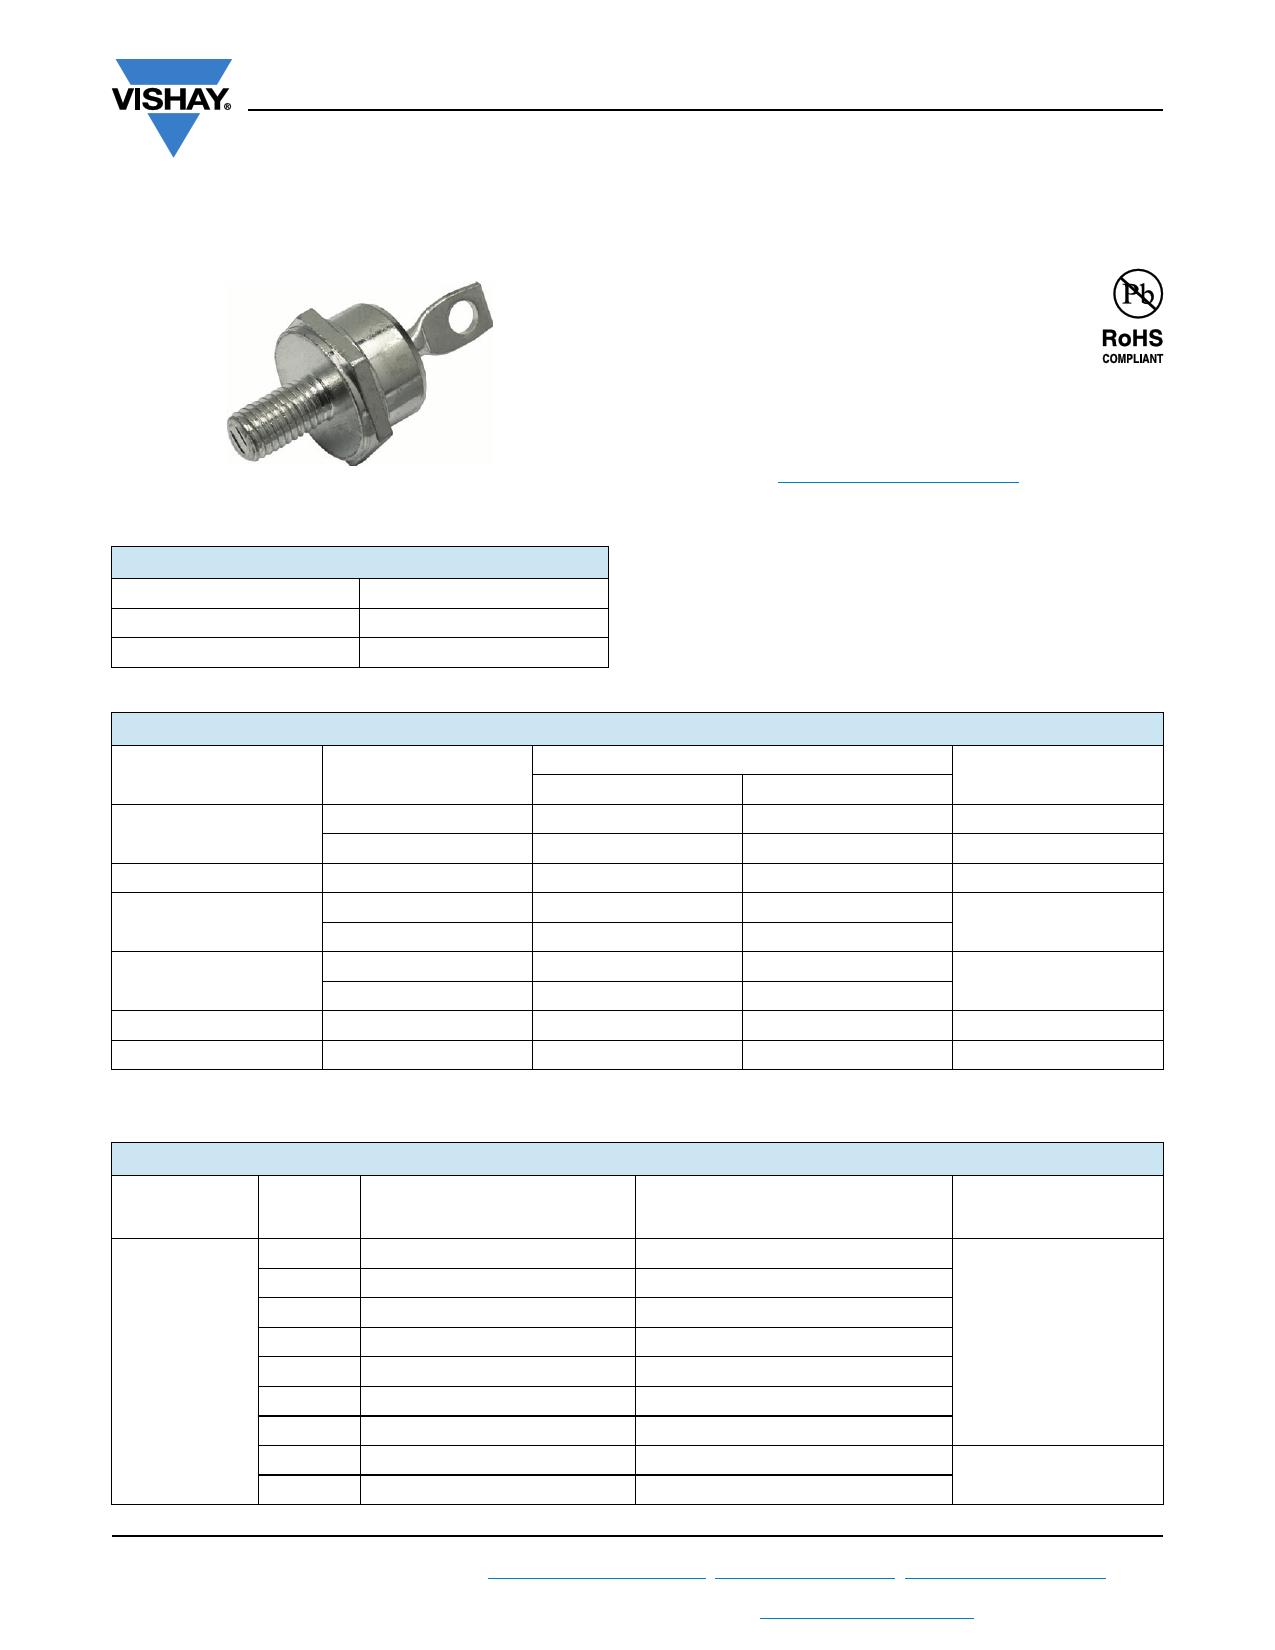 VS-88HF80 datasheet